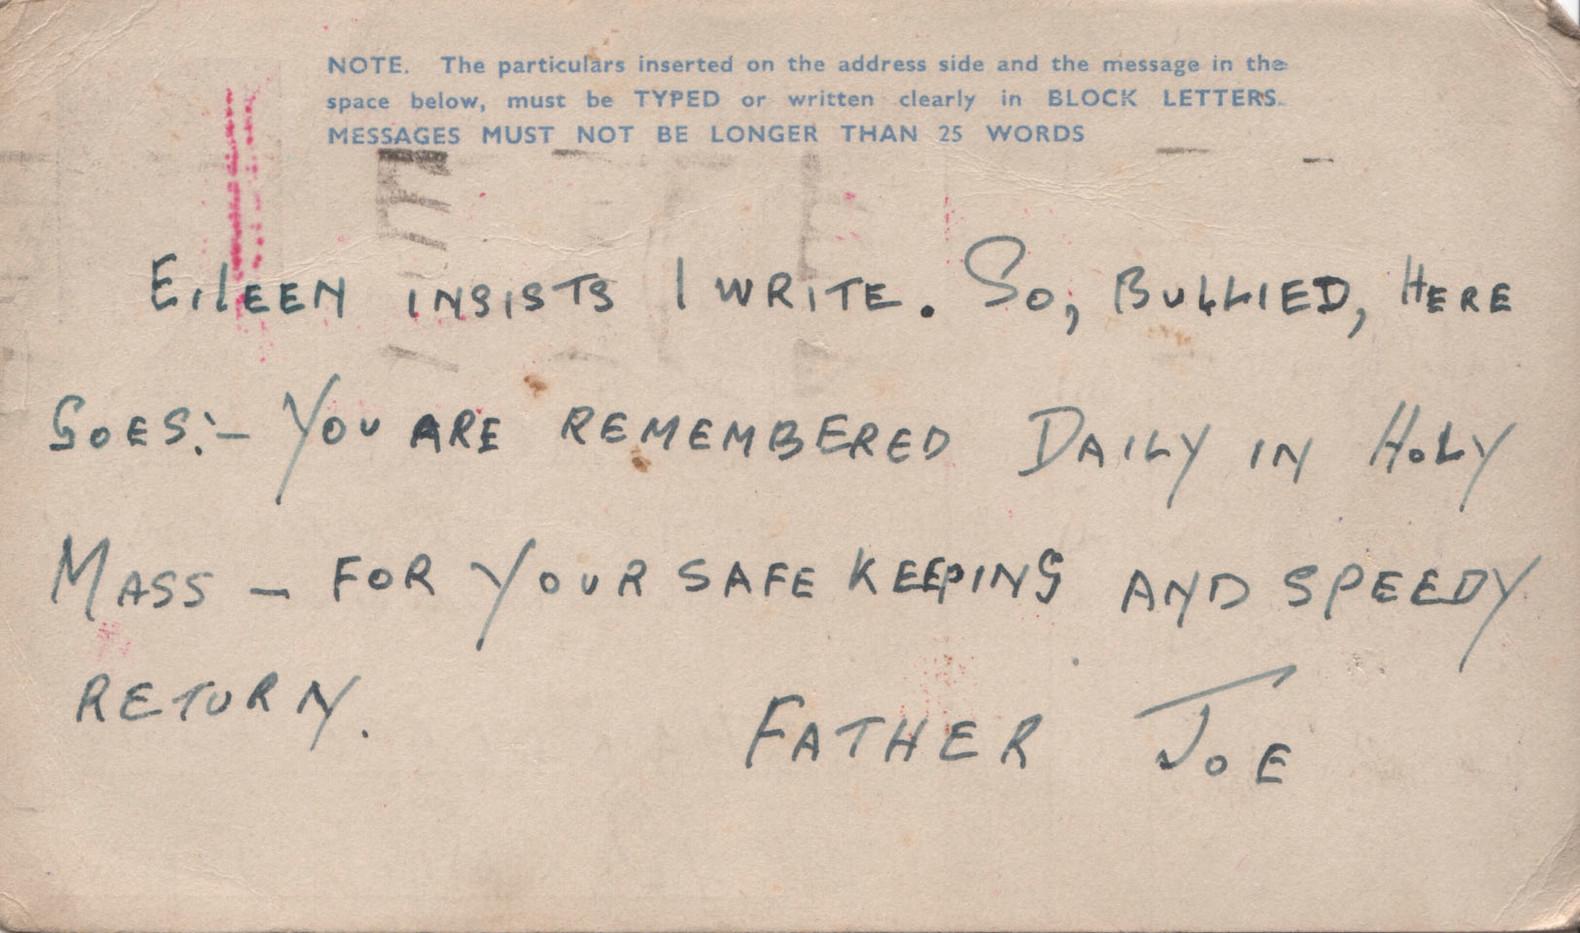 1944.04.08. Fr Joe Murphy